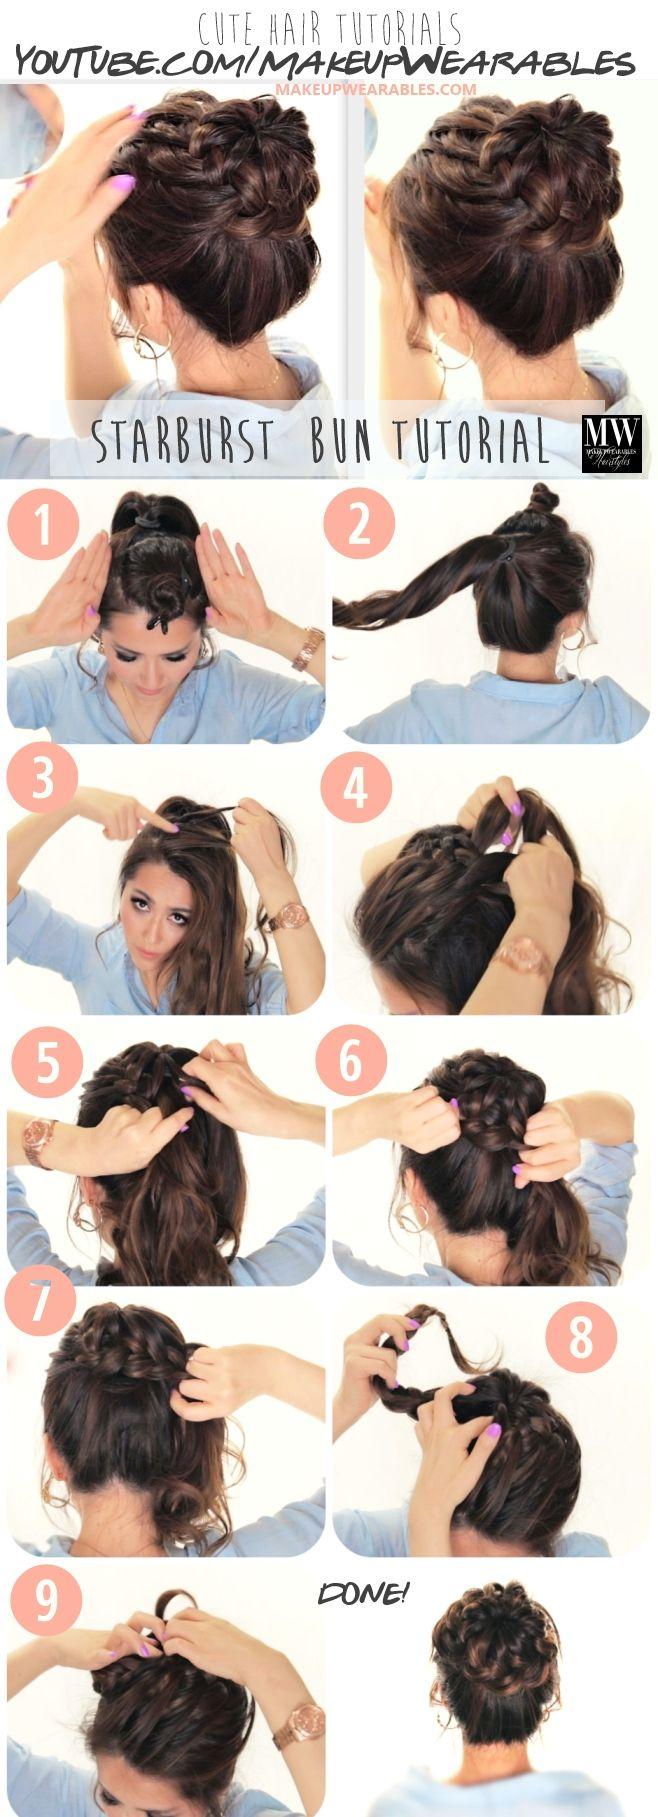 Enjoyable 1000 Ideas About Starburst Braid On Pinterest Braids Braided Hairstyles For Women Draintrainus